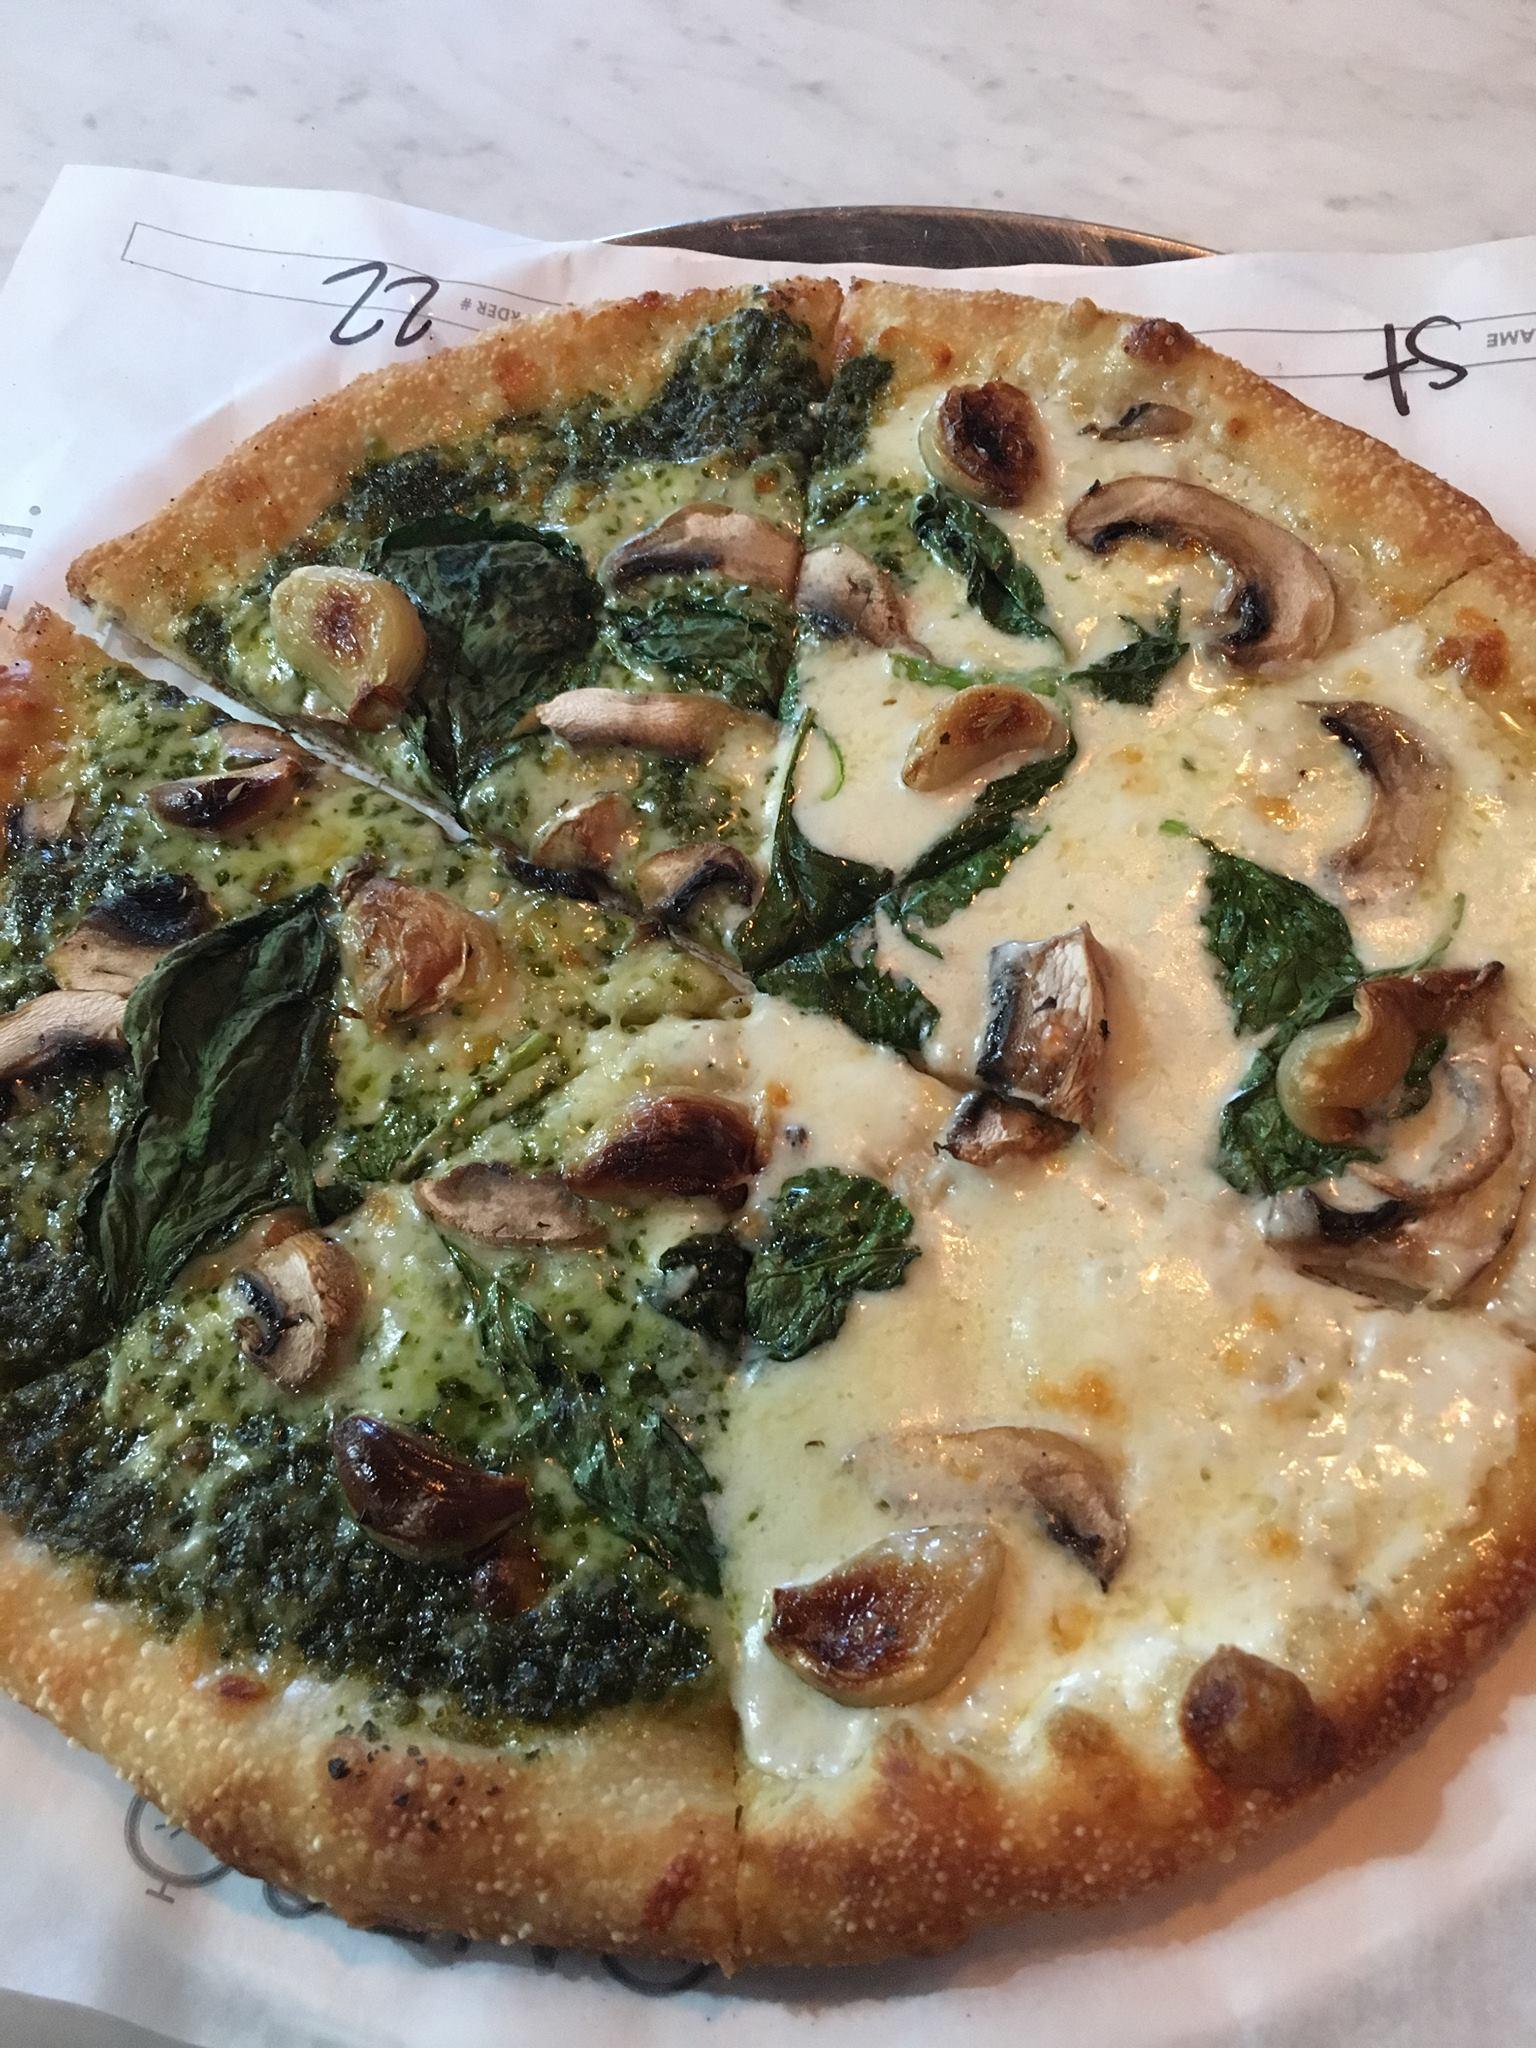 Brand New Build Your Own Kosher Pizza Now Open In La One80 Pizzeria Yeahthatskosher Restaurants Travel